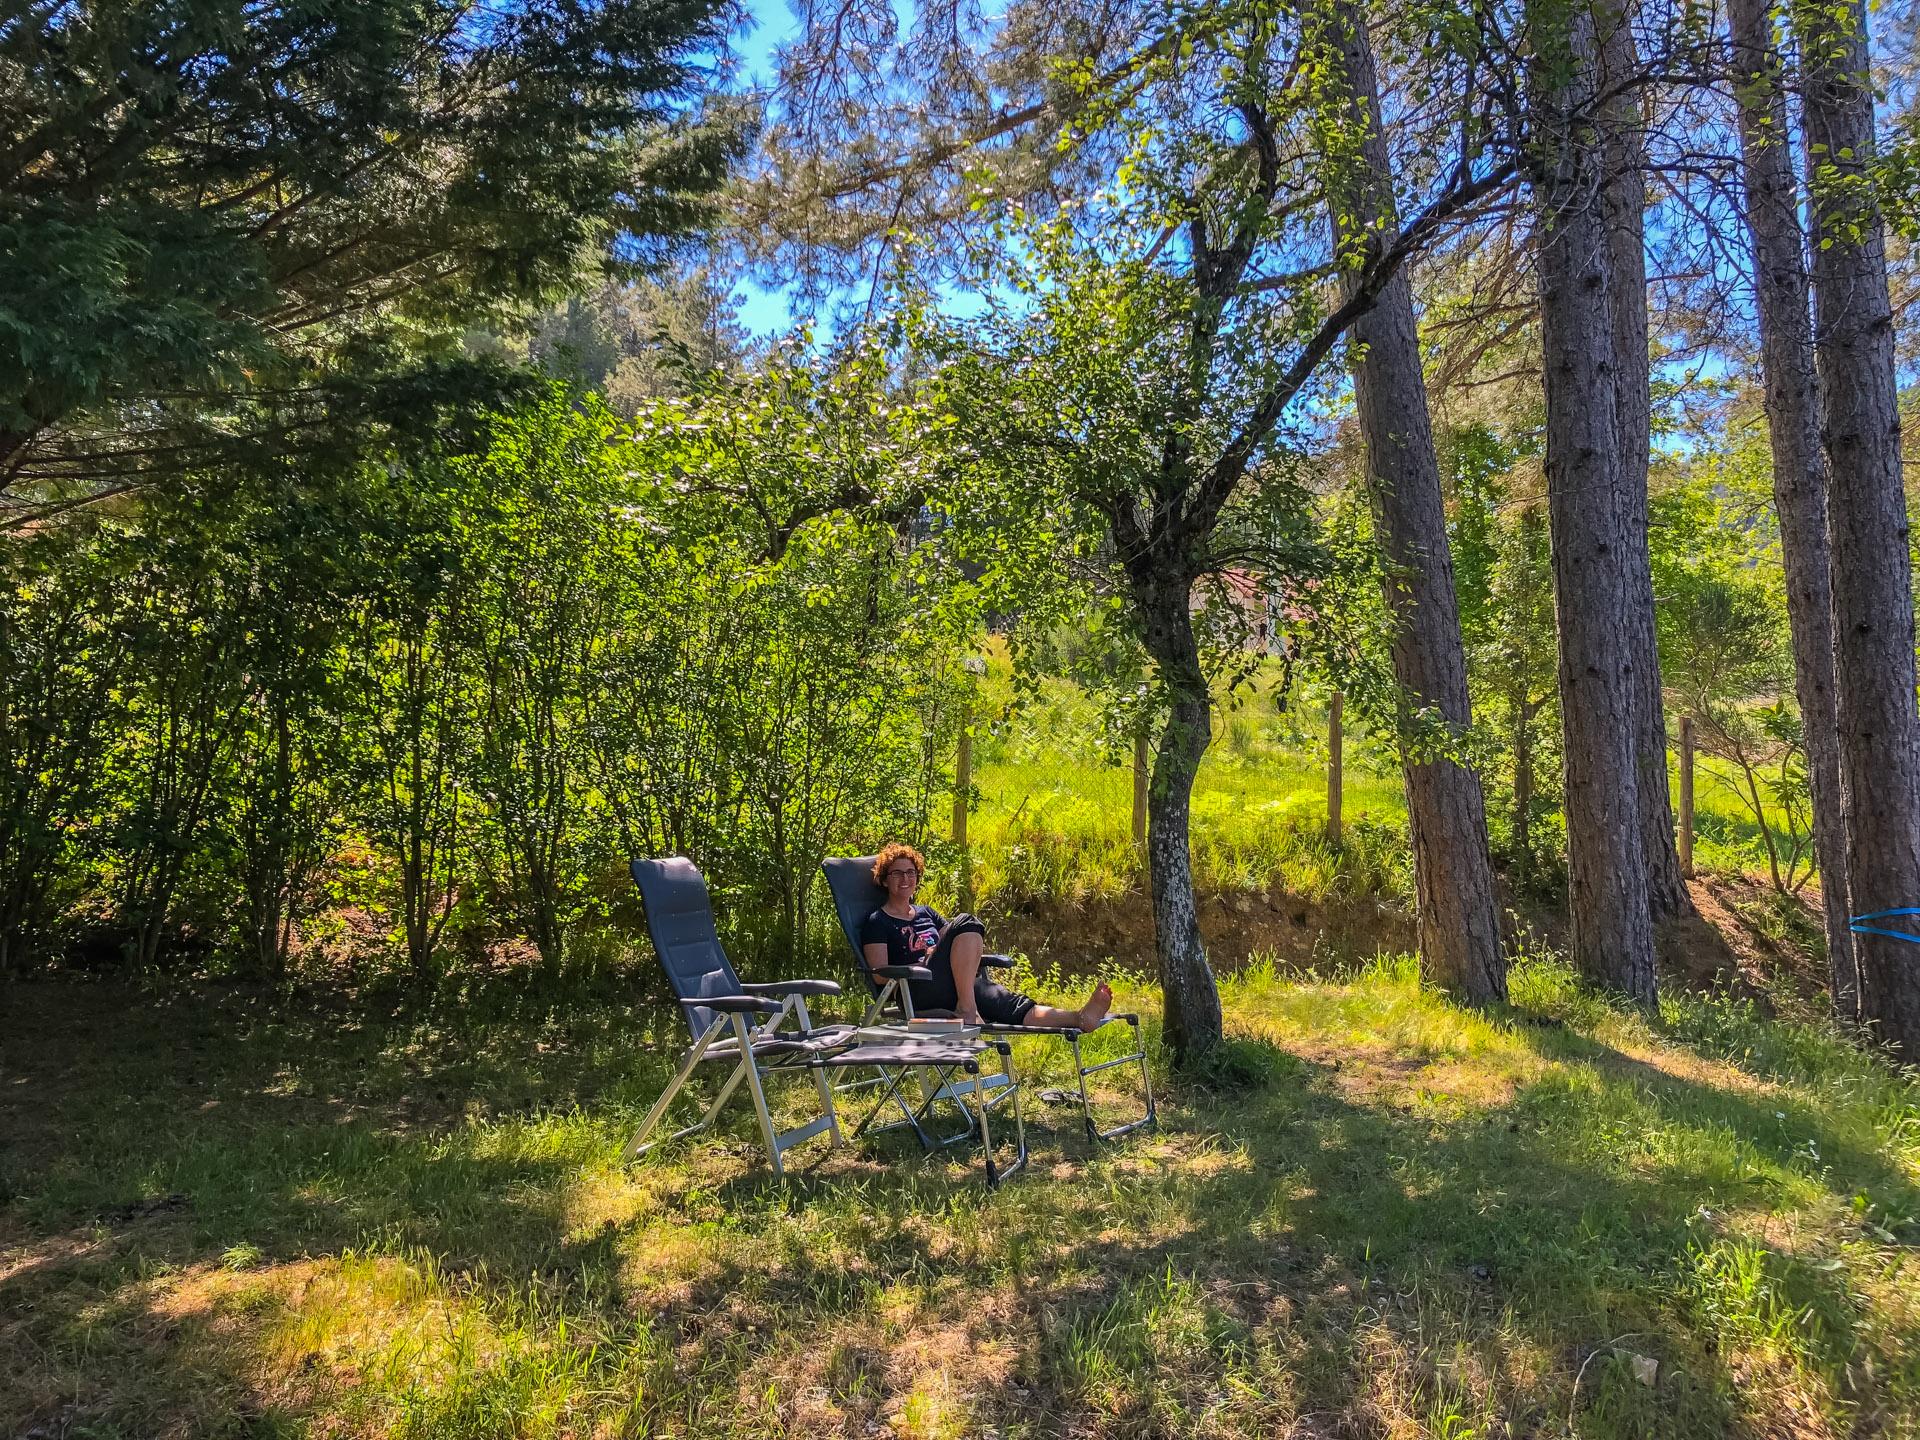 Camping Le Soleil